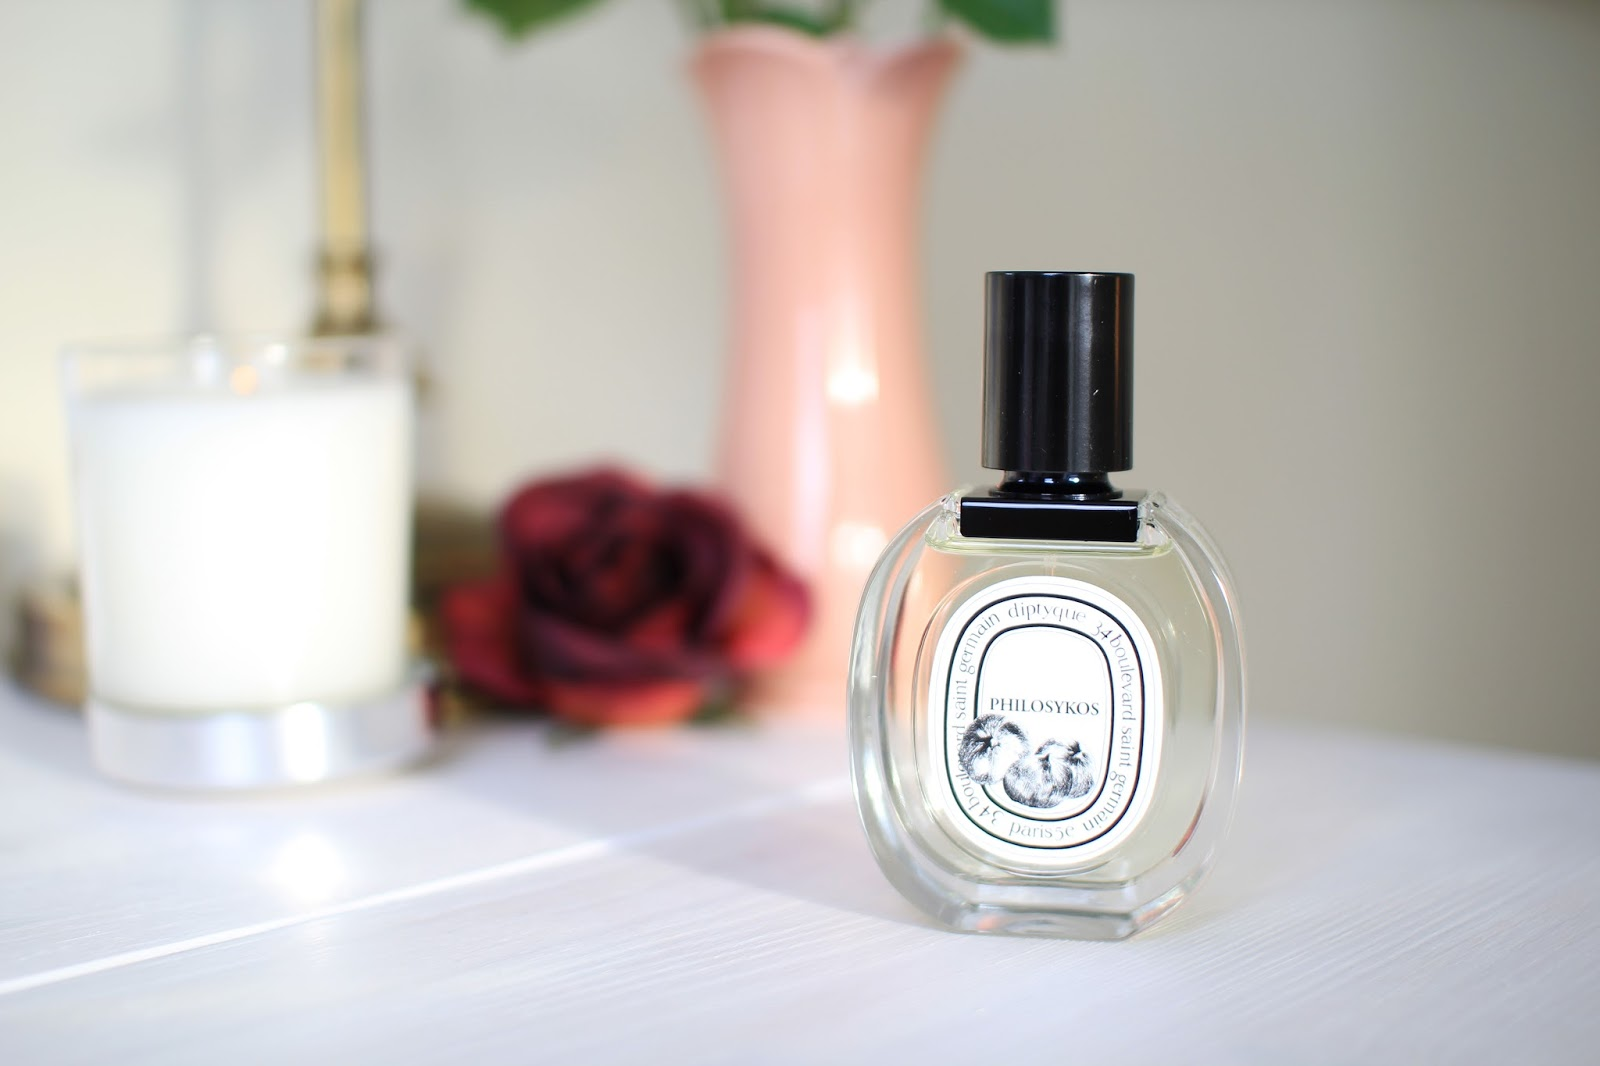 Diptyque Philosykos Eau De Parfum.A Change In Scent Diptyque Philosykos Fragrance Inthefrow